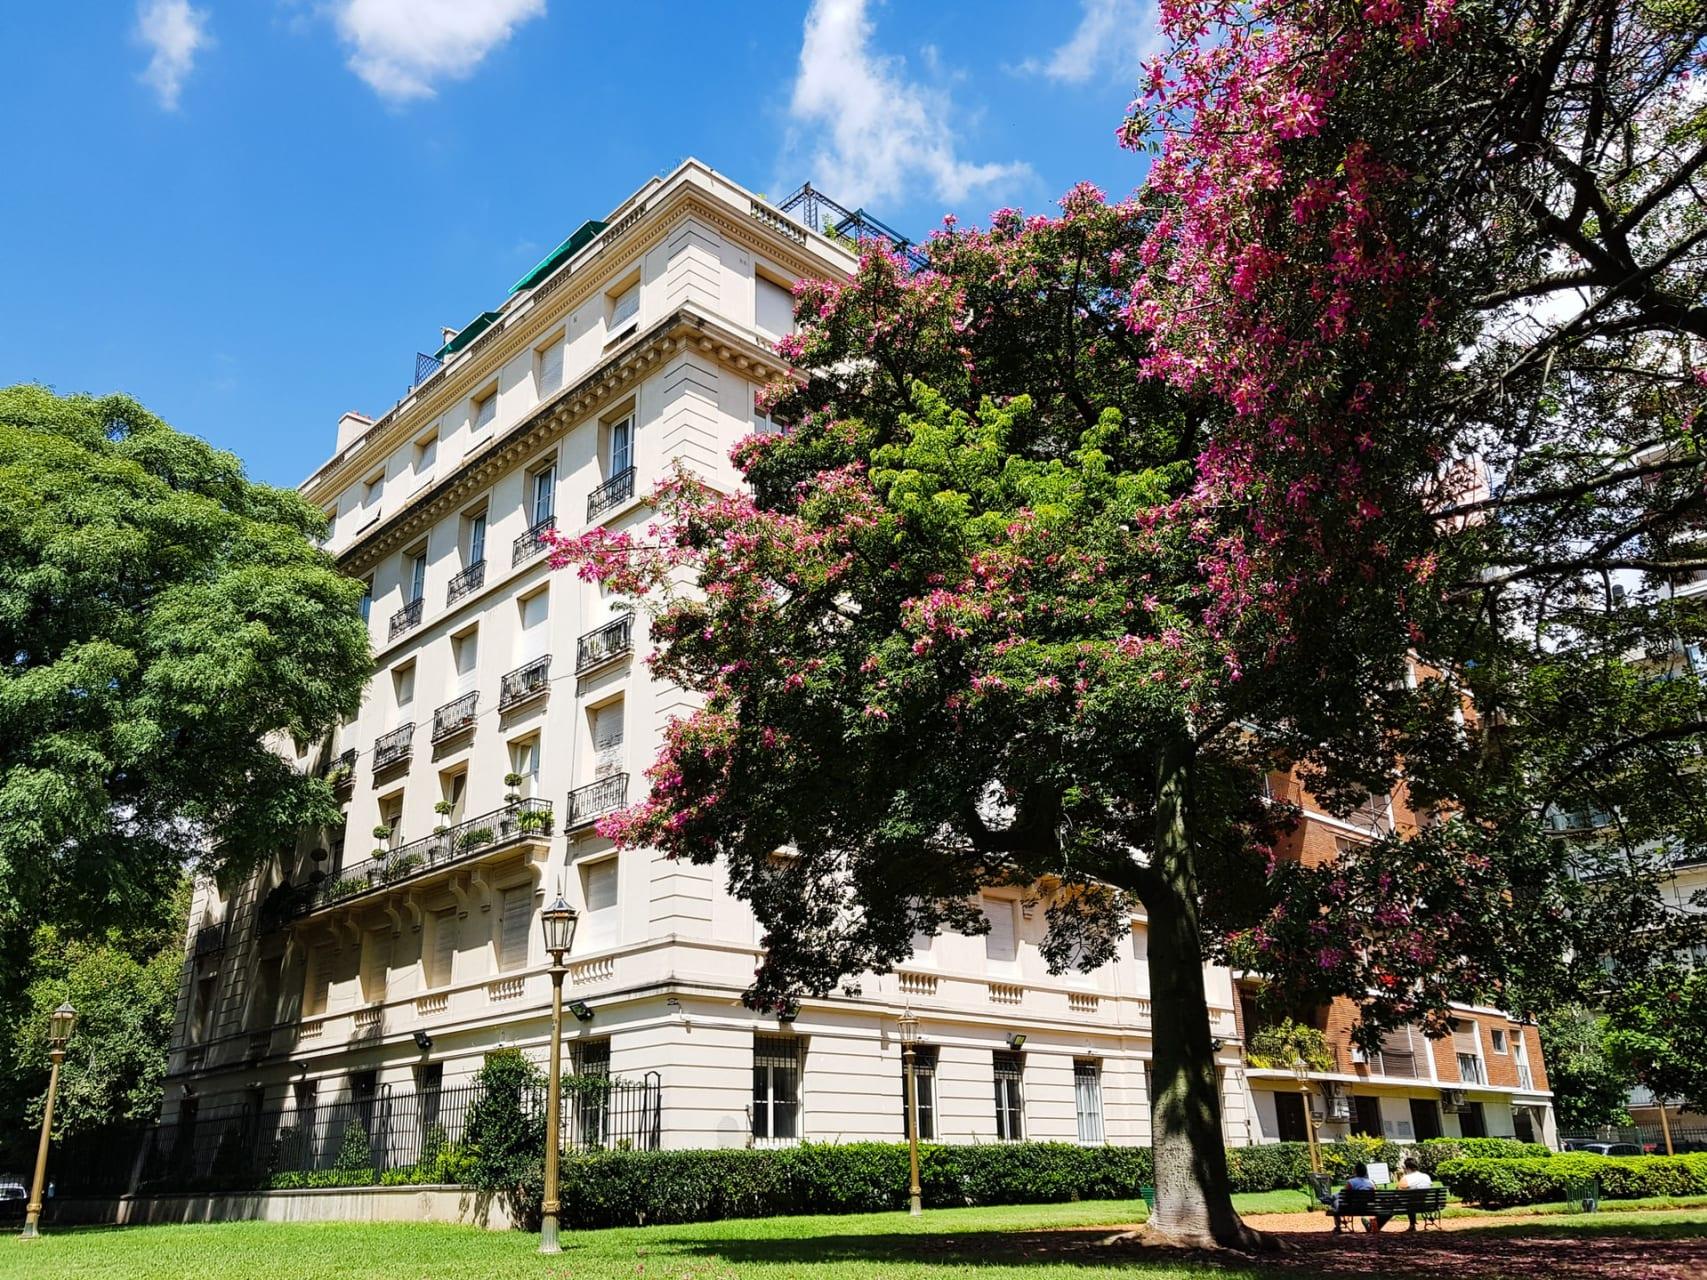 Buenos Aires - Buenos Aires: Recoleta Part 1: The Palaces of Alvear Avenue